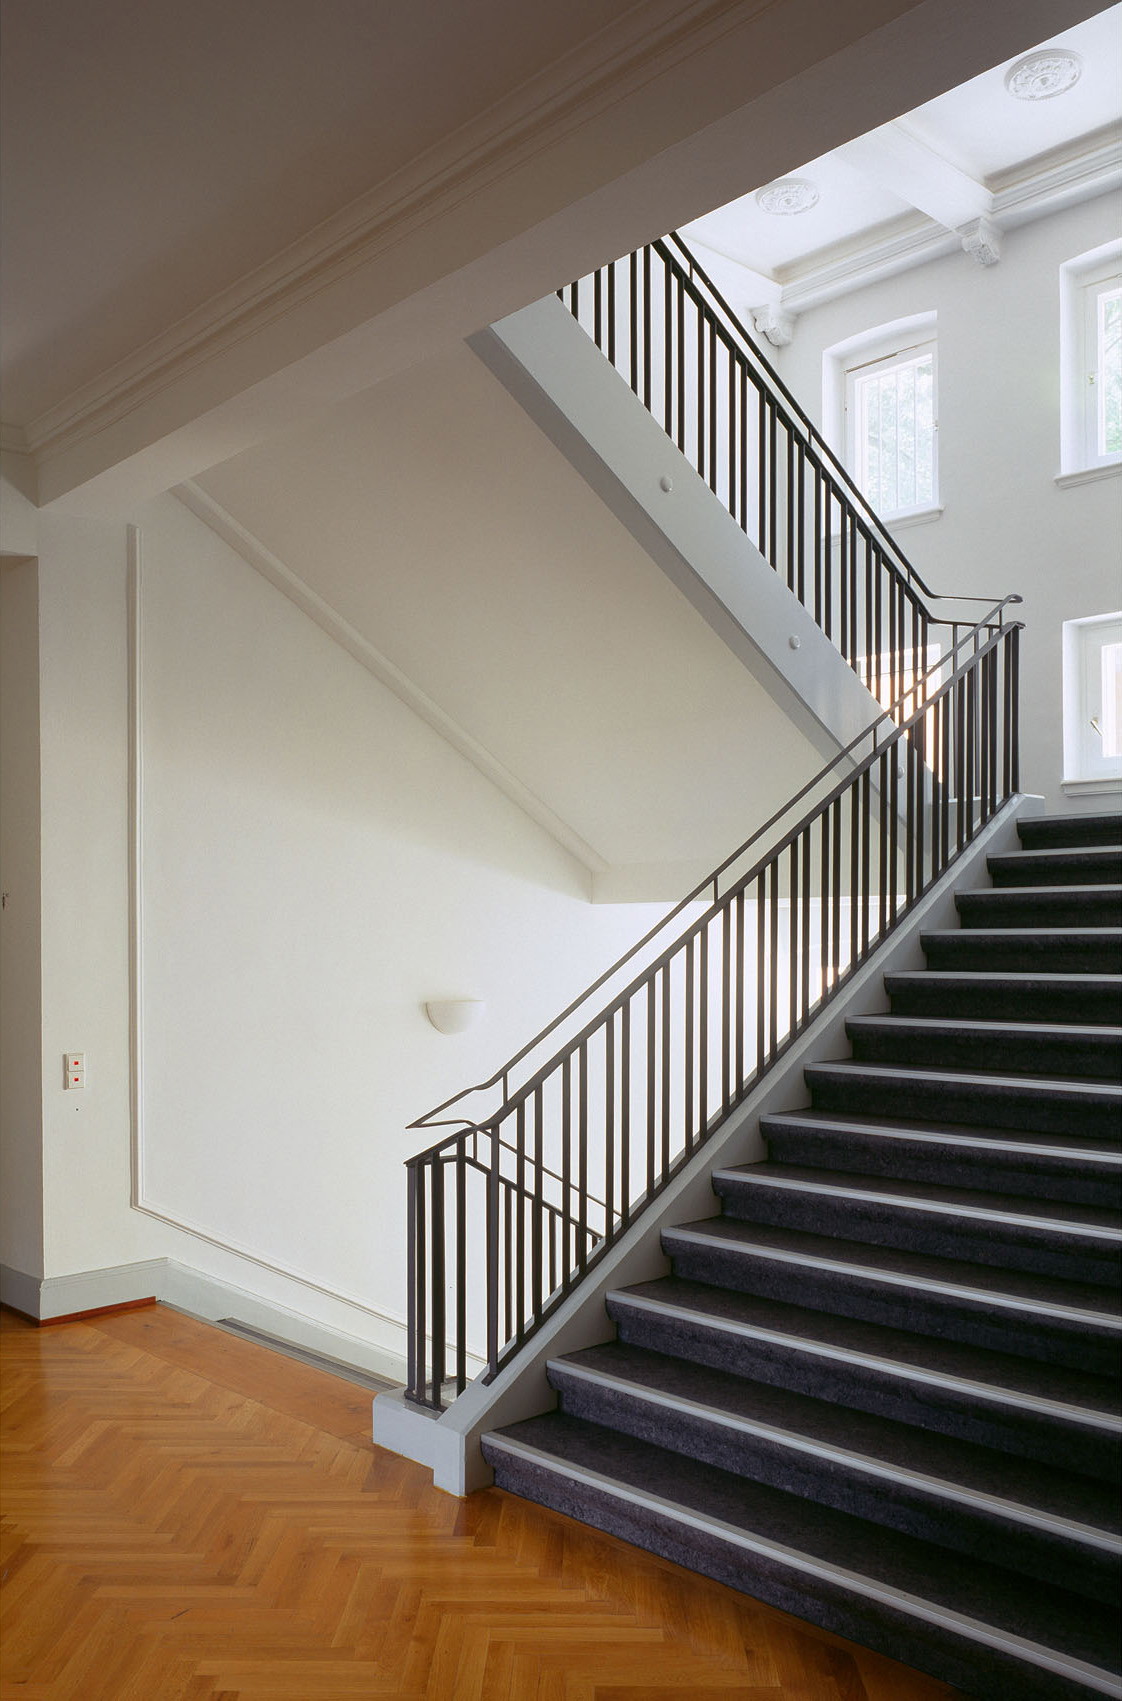 Moratahaus Treppenhaus.jpg